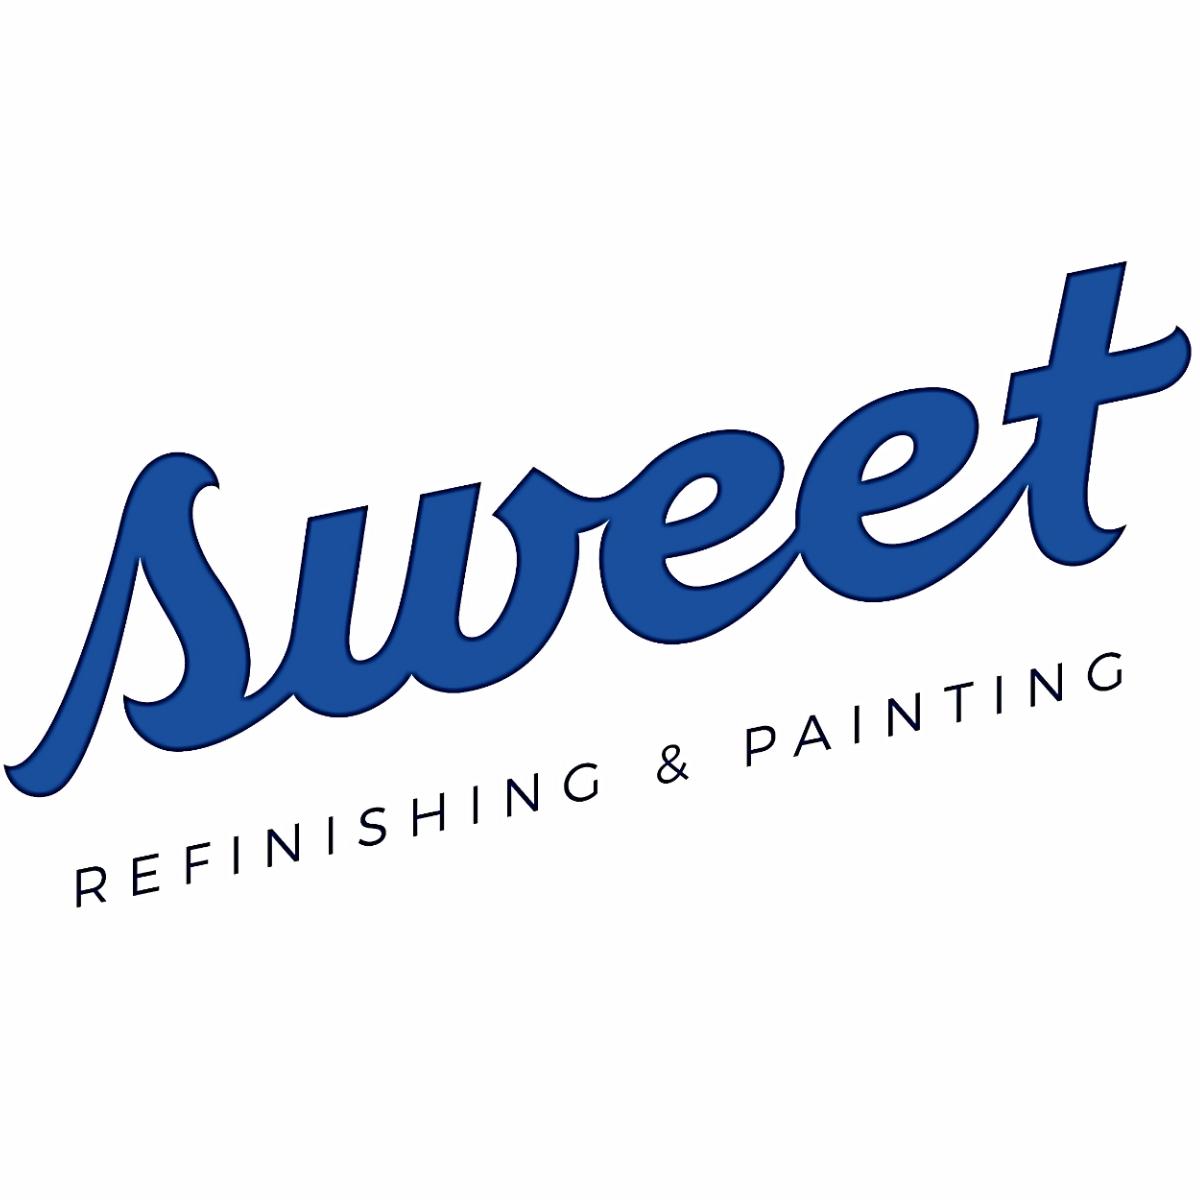 Sweet Refinishing & Painting